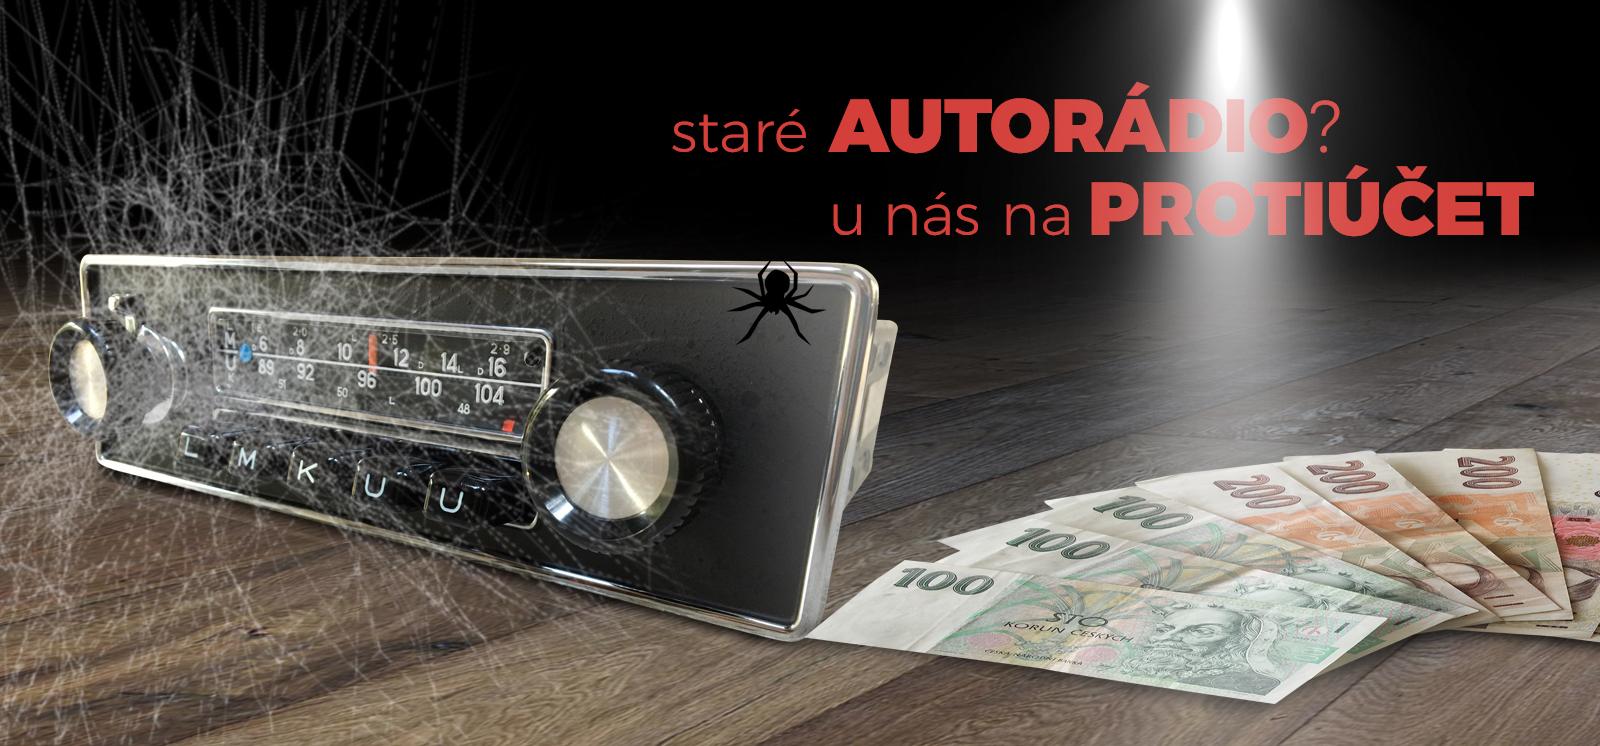 Autorádia na protiučet u 2din.cz